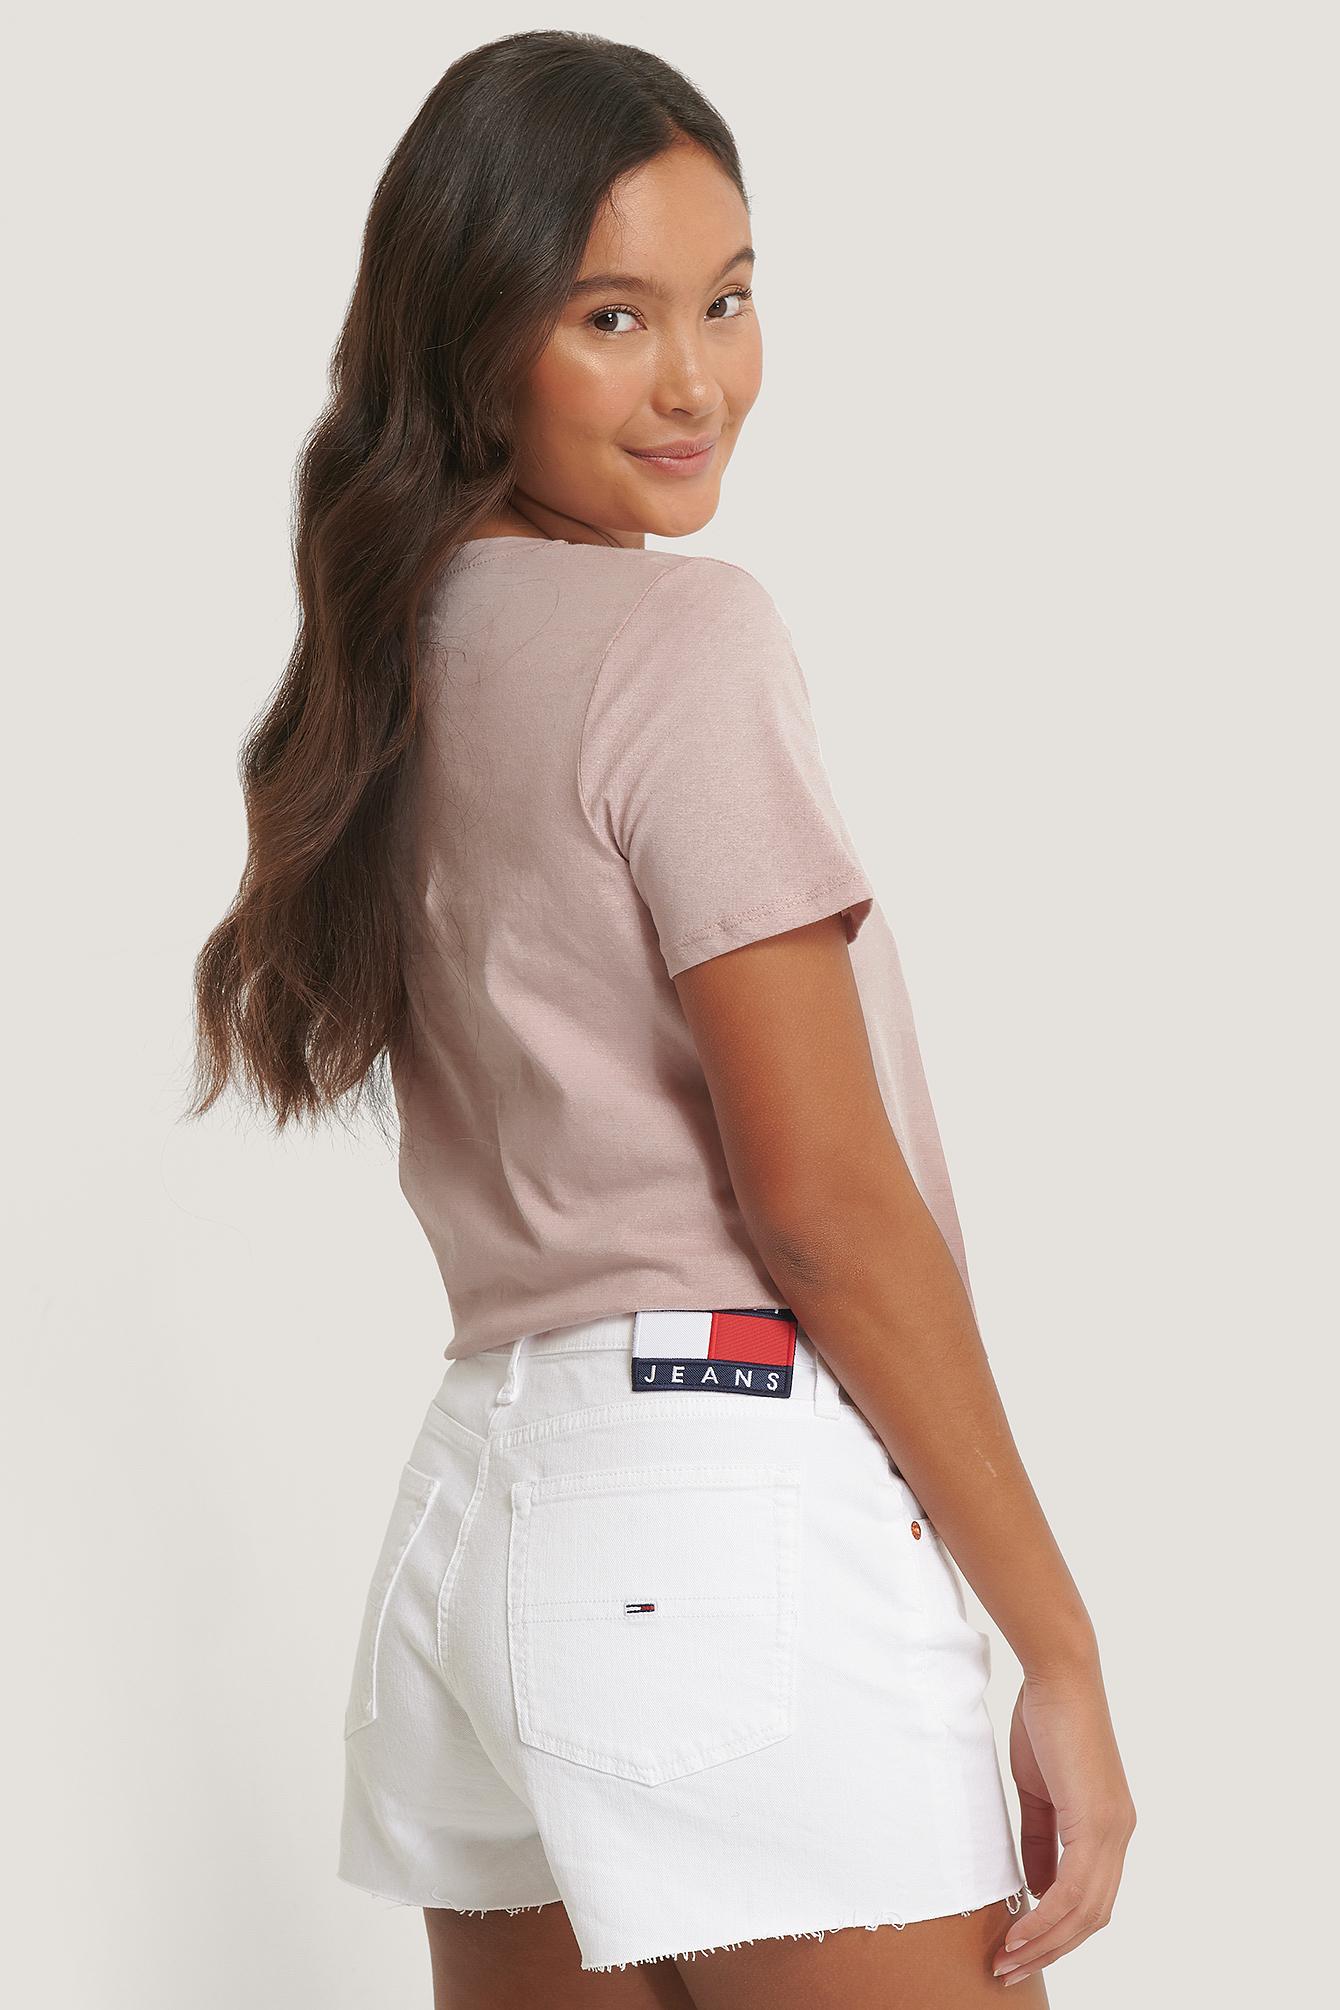 Tommy Jeans Denimshorts - White